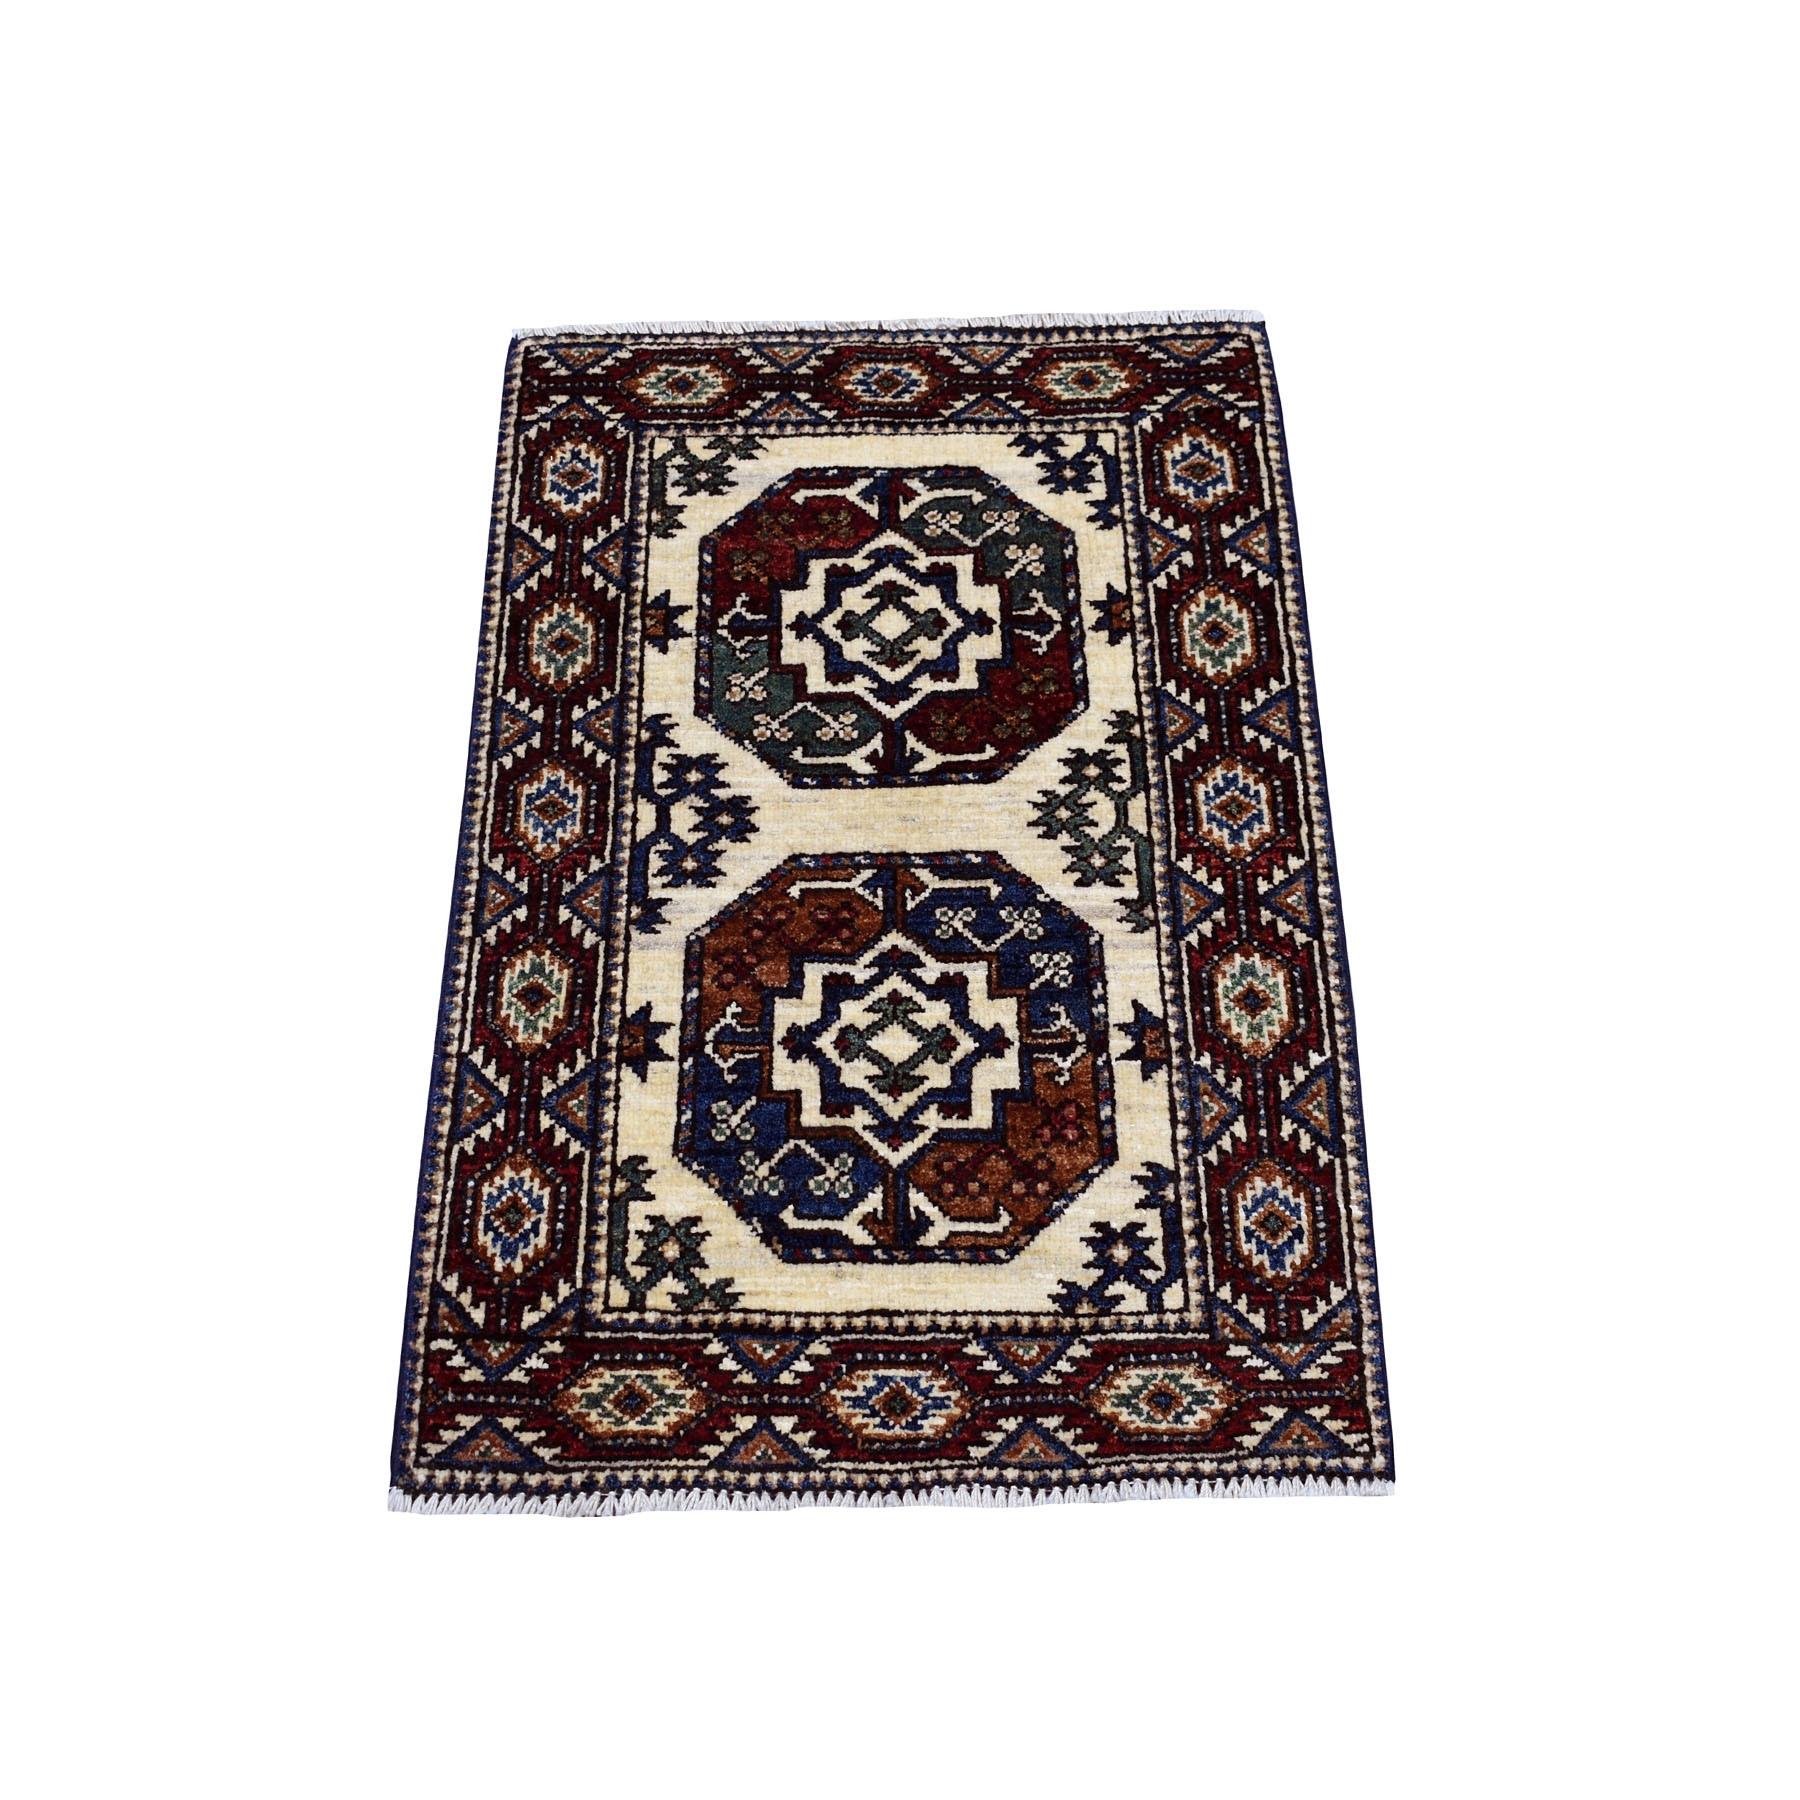 "1'10""X2'9"" Ivory Turkoman Afghan Ersari Hand Knotted Elephant Feet Design Pure Wool Oriental Rug moaecbd0"